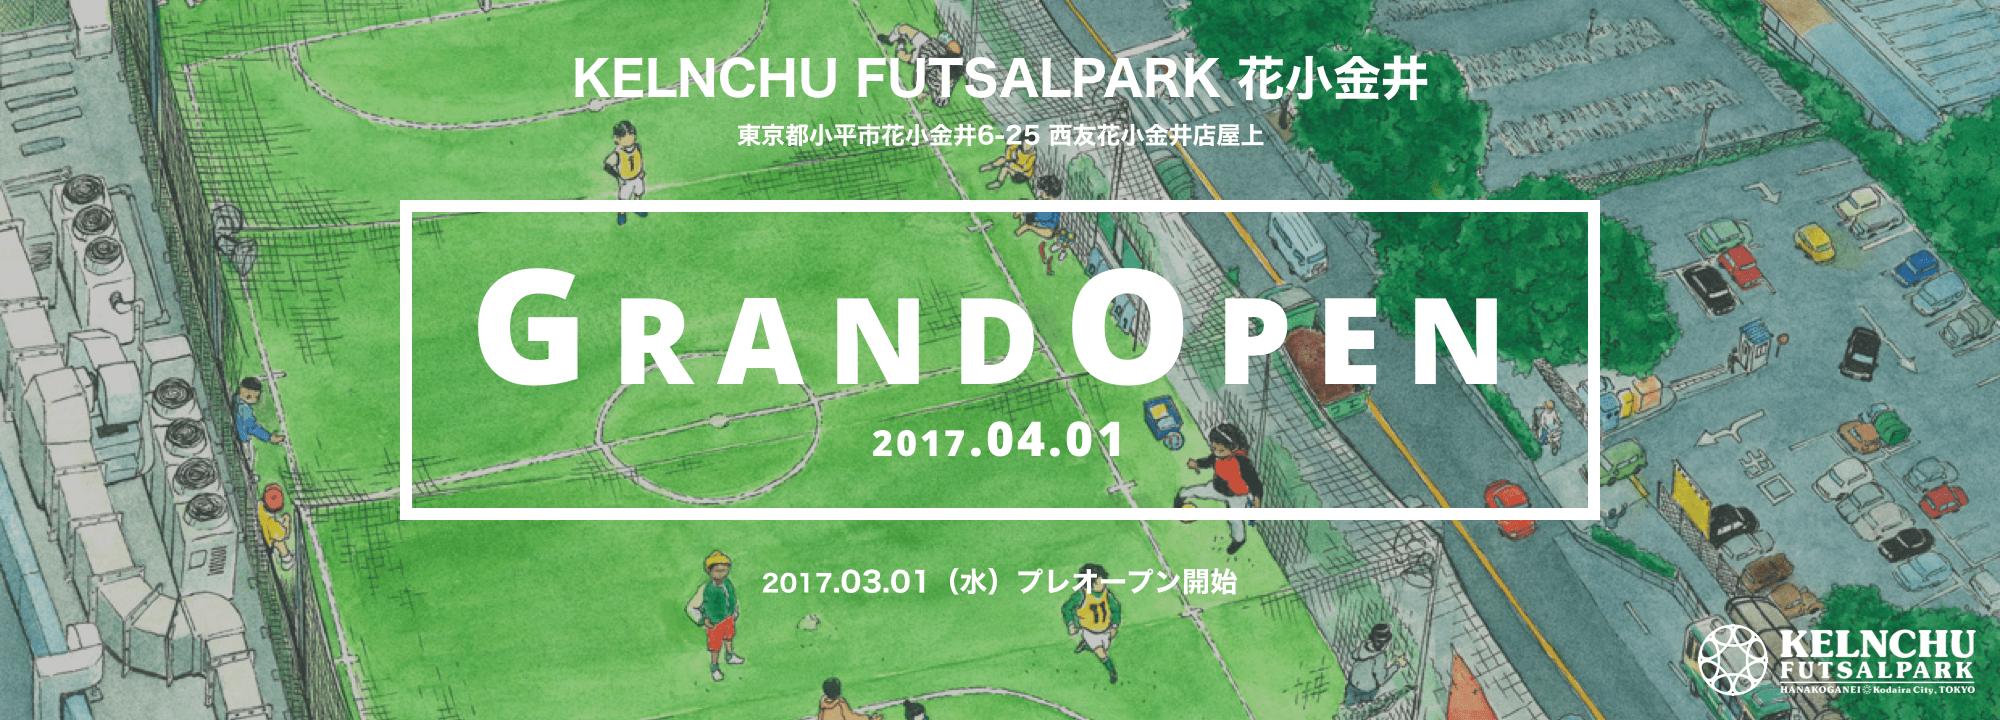 GRAND OPEN 2017.04.01